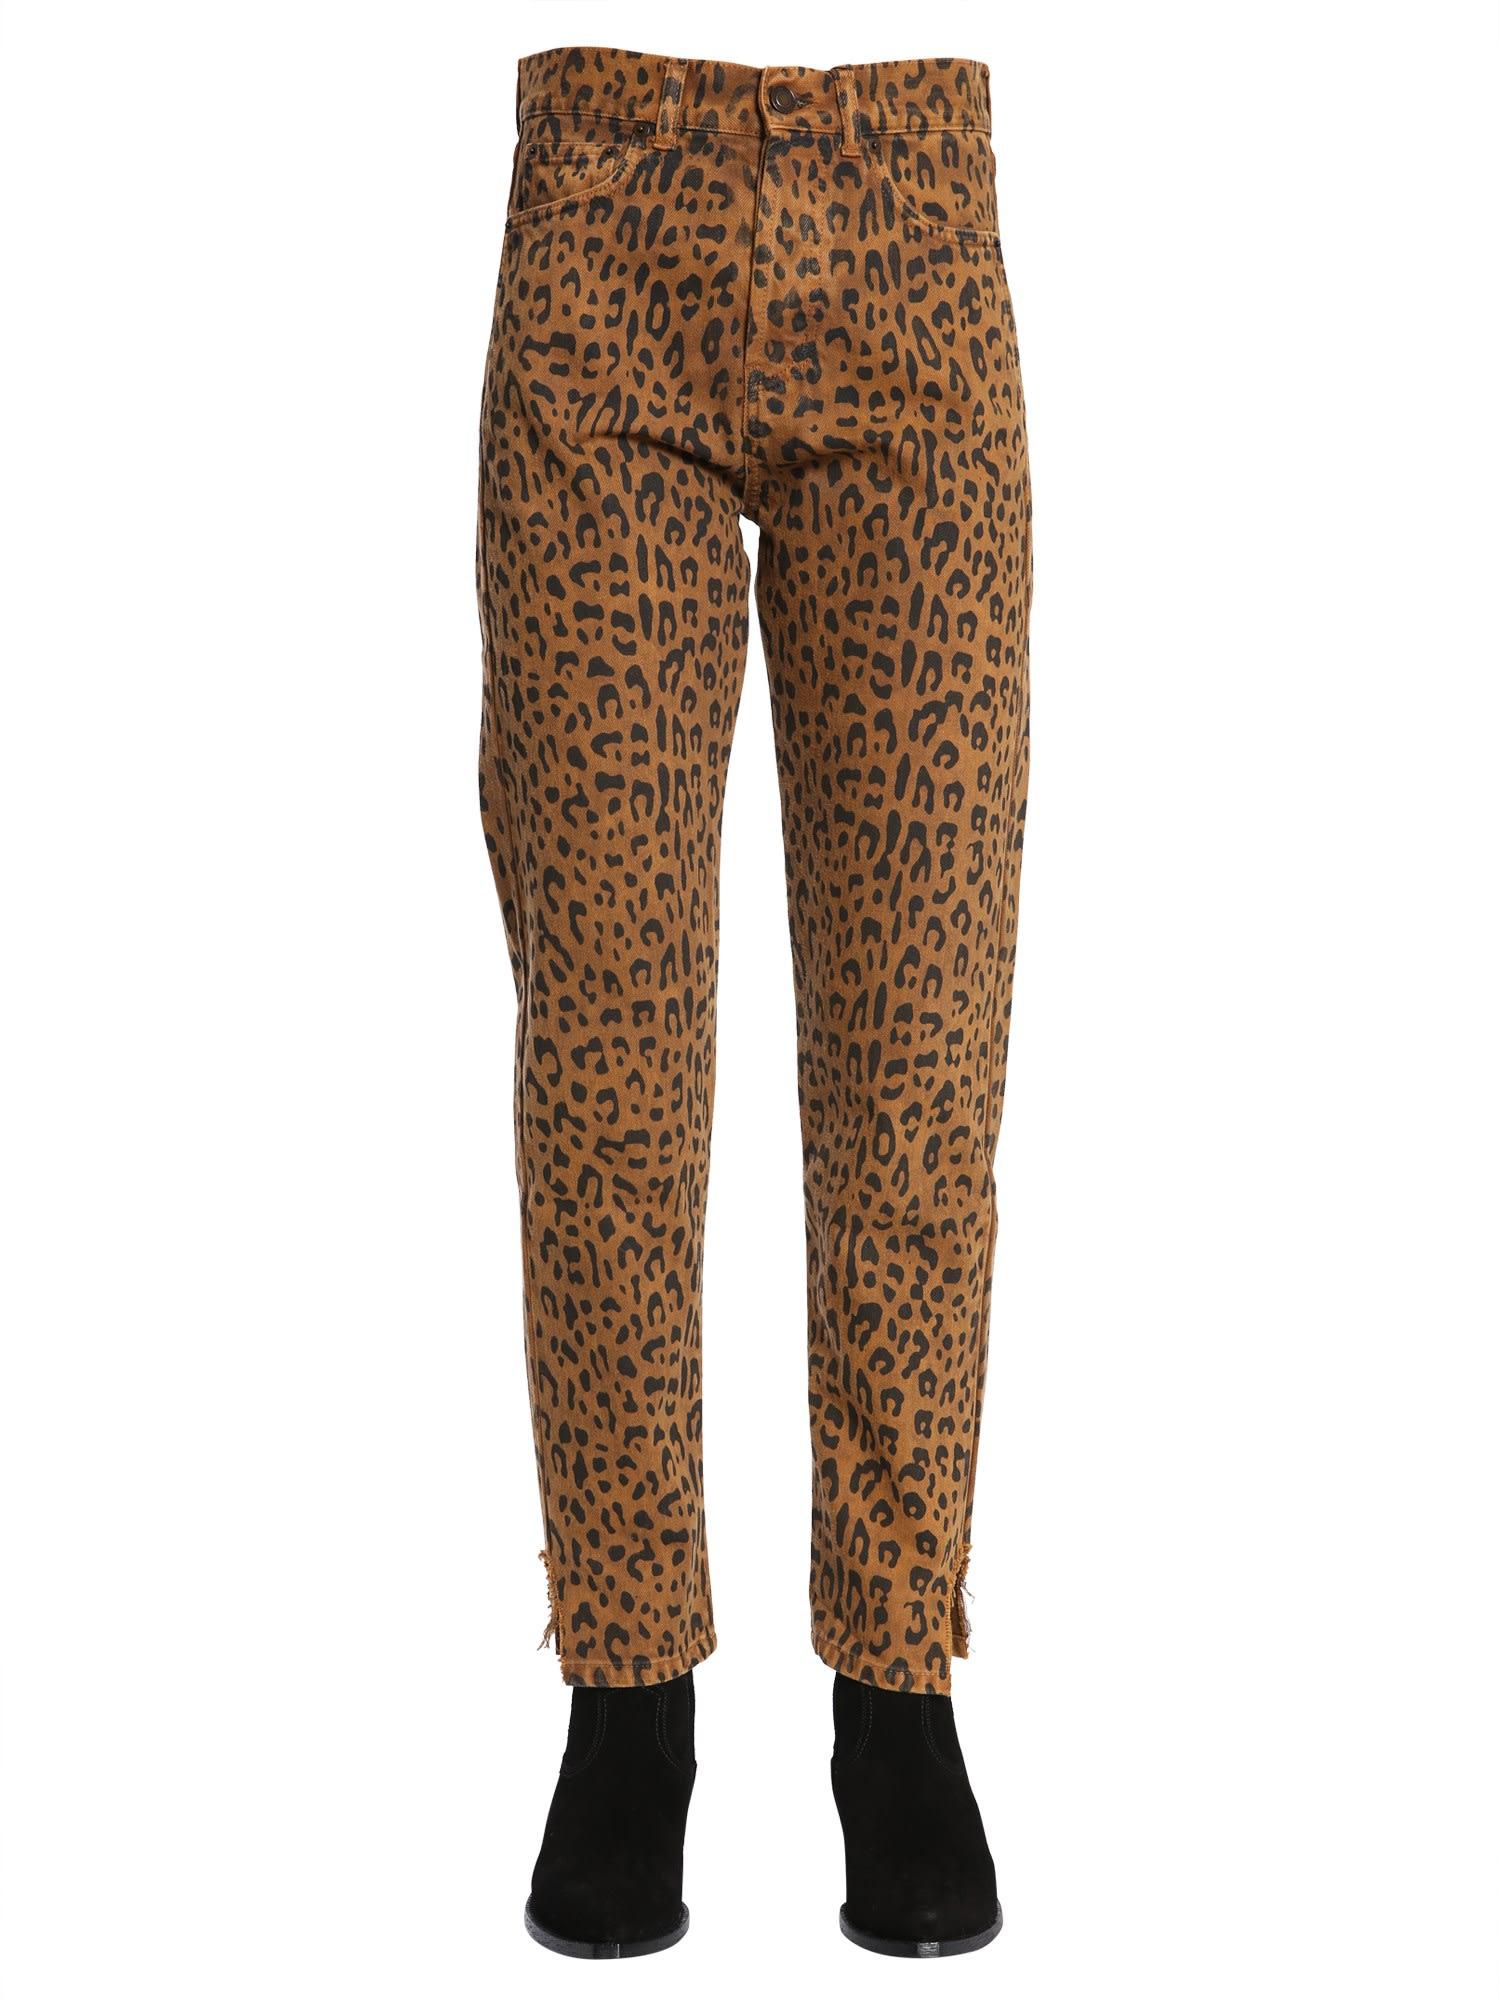 Saint Laurent Slim Fit Hjeans In Leopard Print